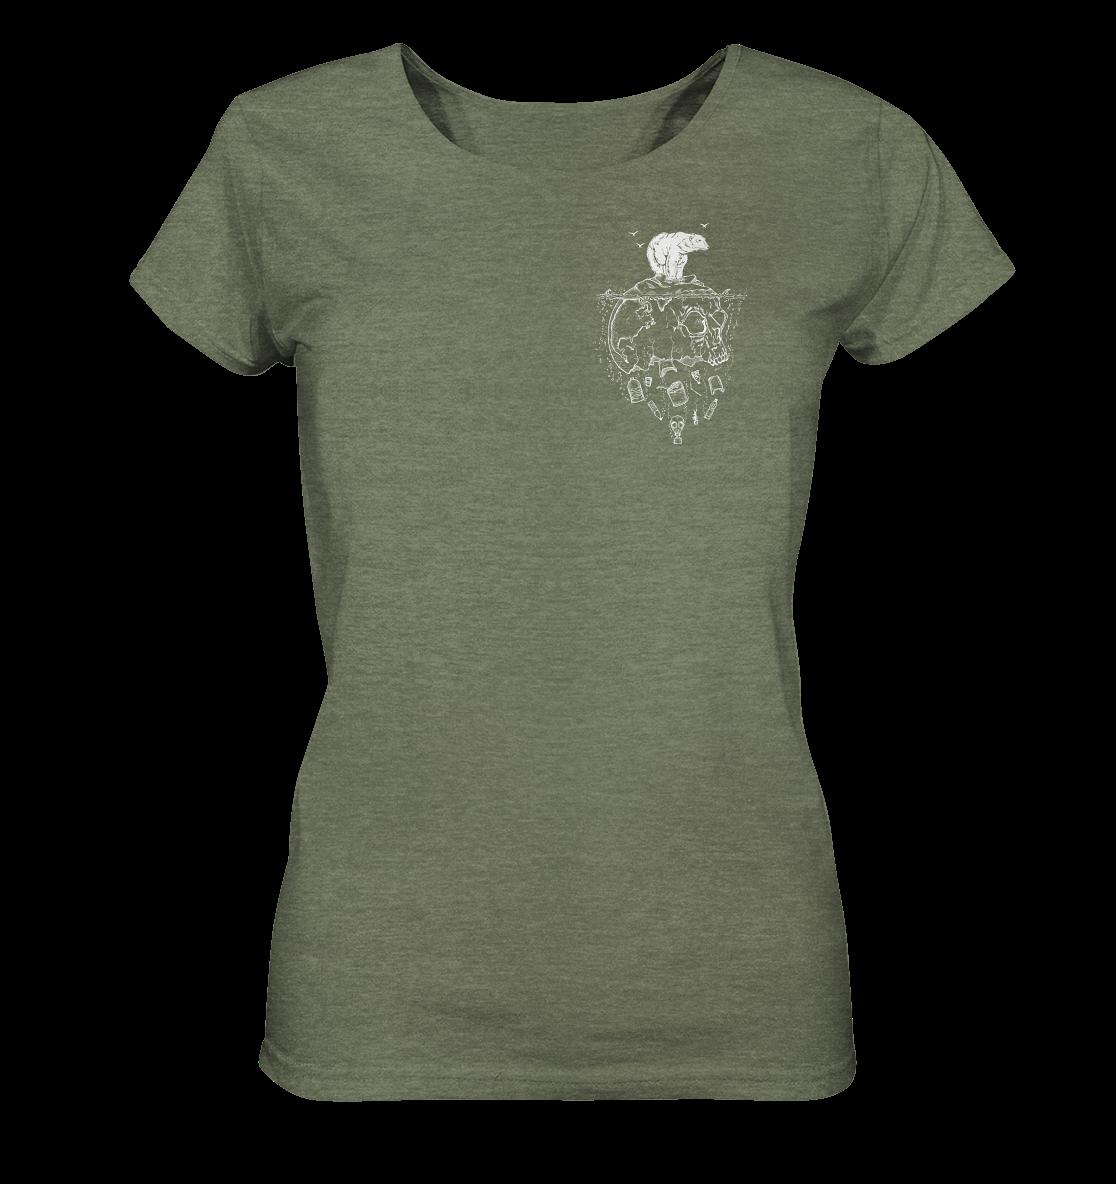 front-ladies-organic-shirt-meliert-616b52-1116x-20.png